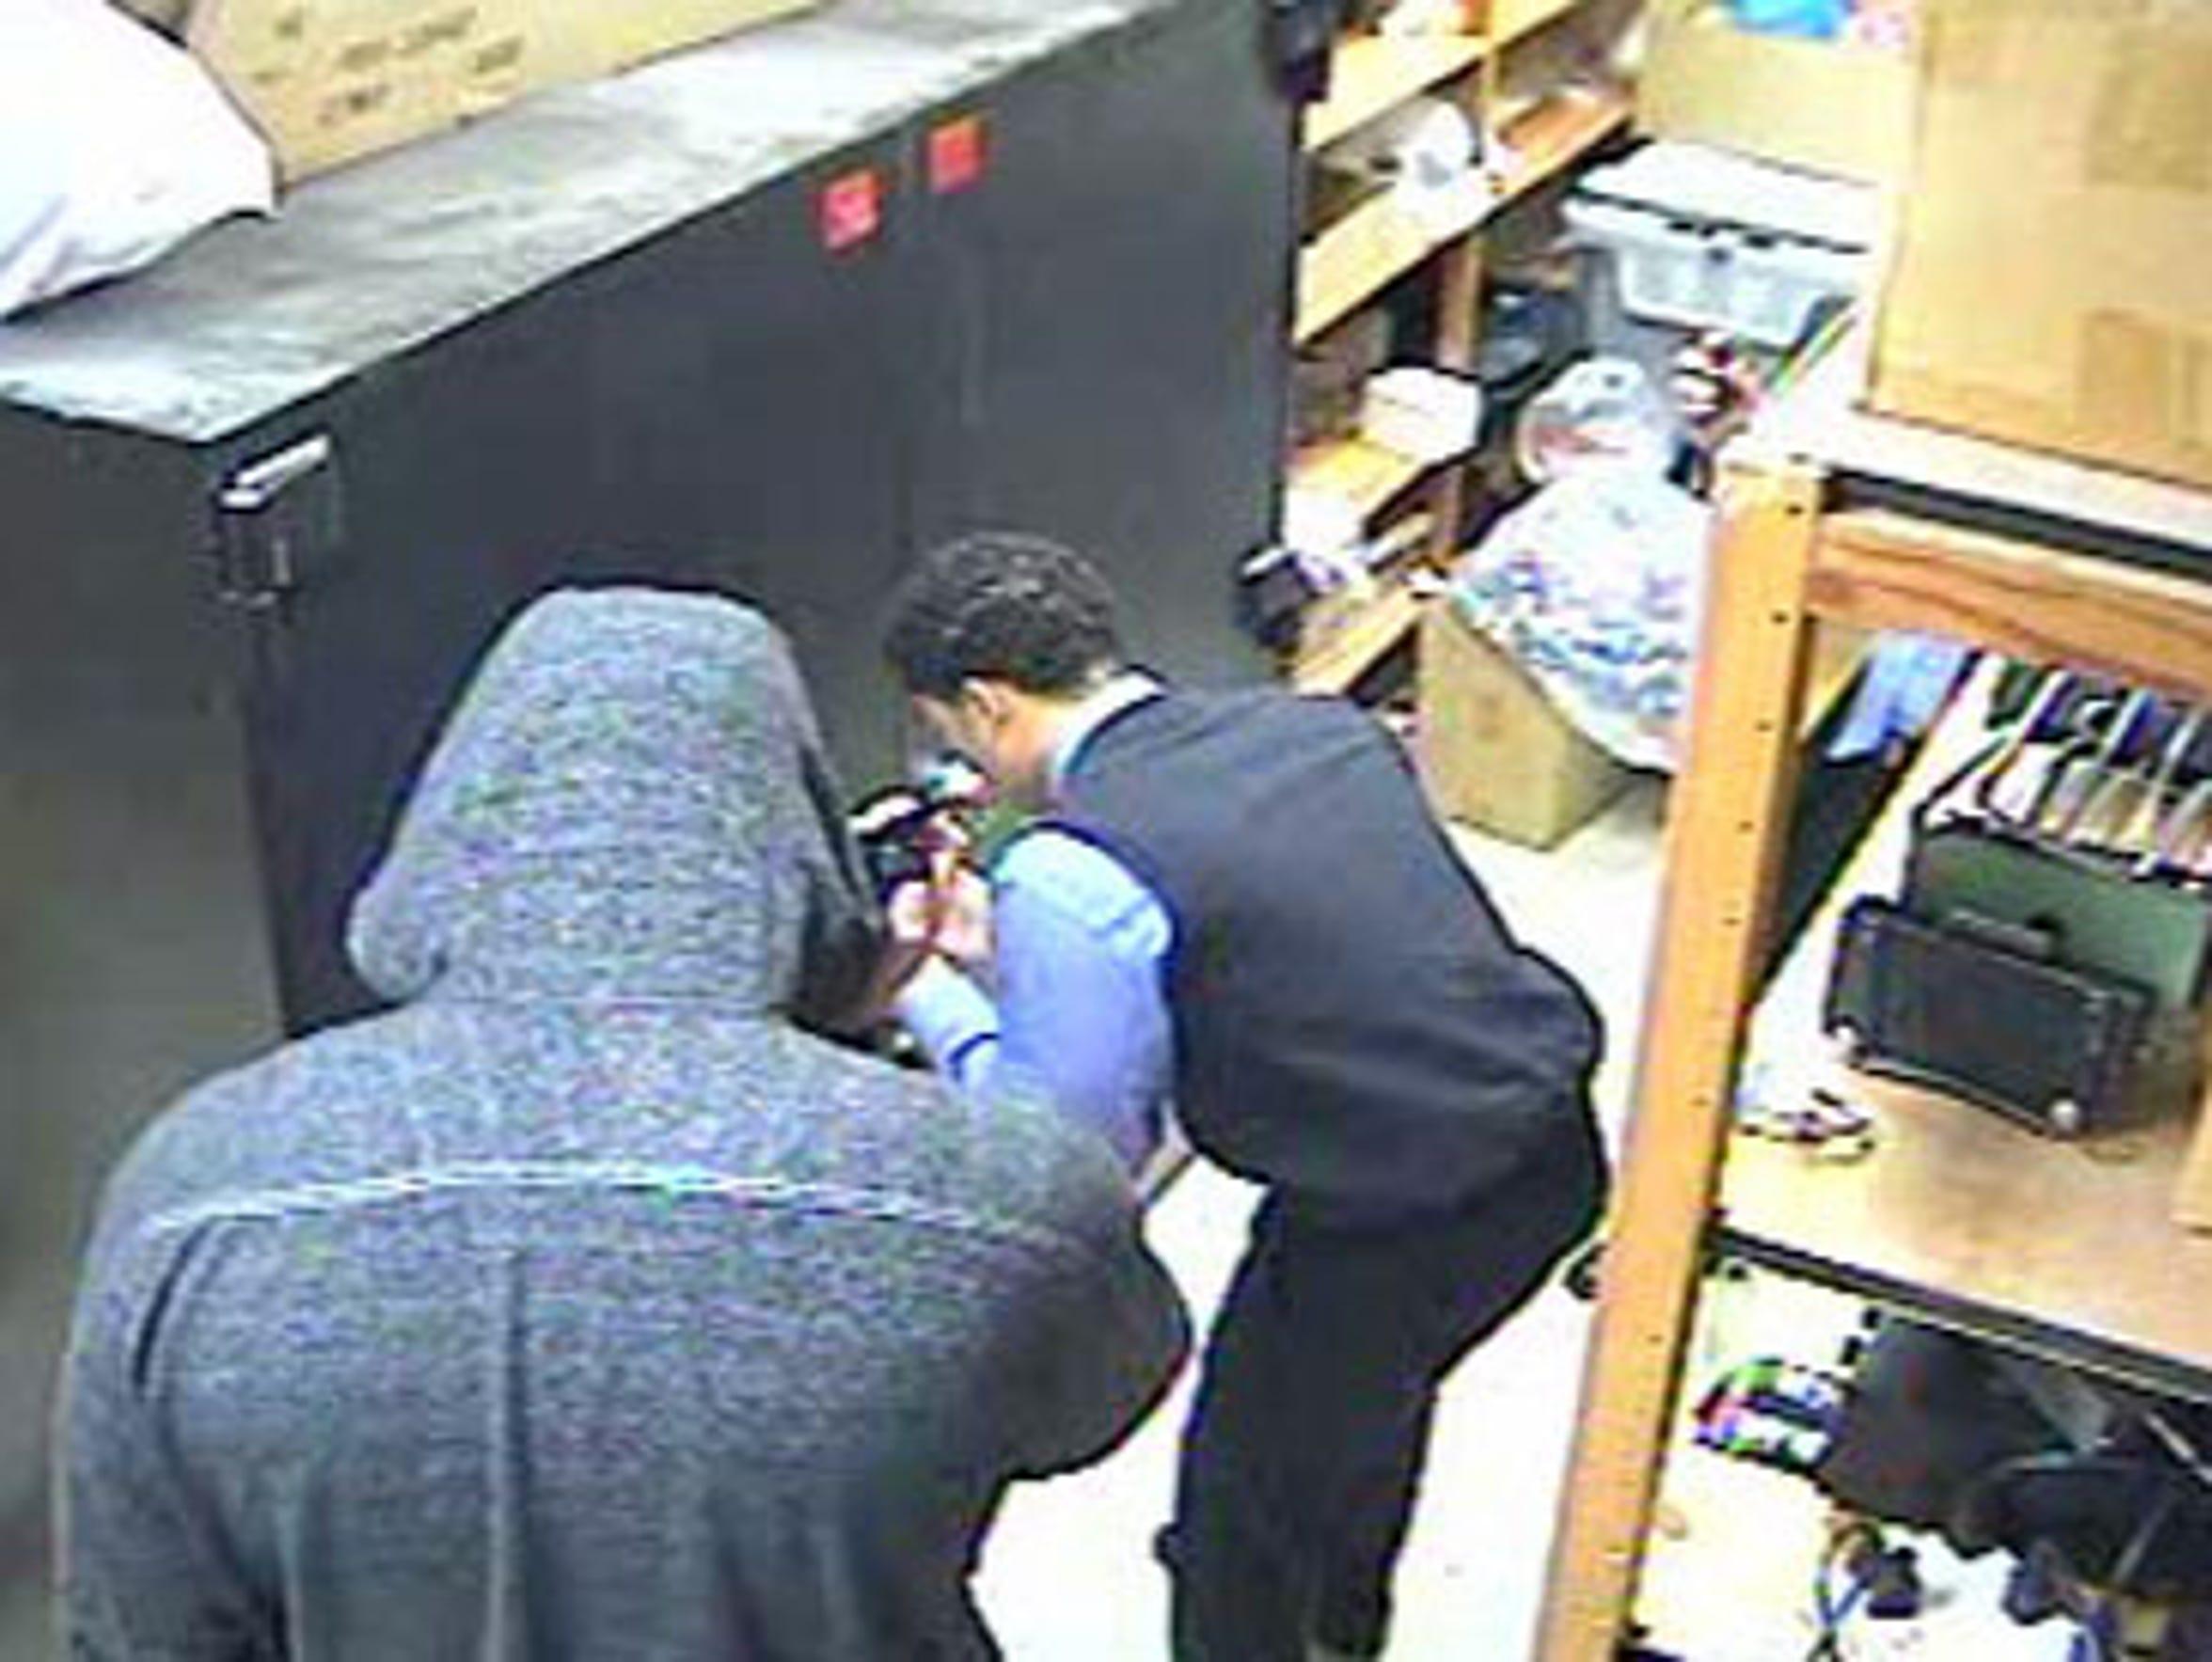 A surveillance-camera image introduced as evidence